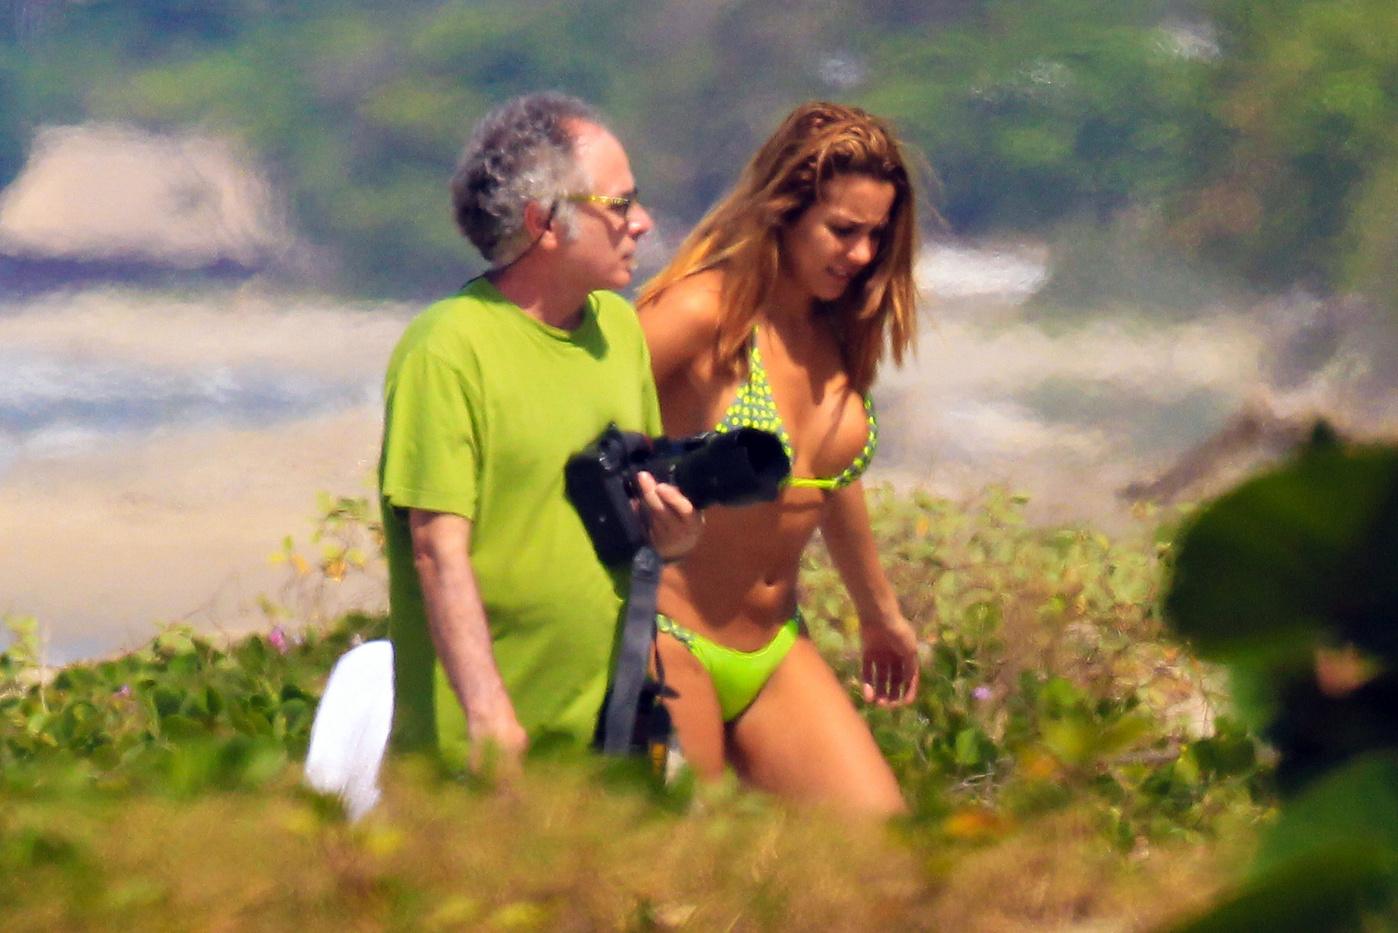 Pics Viviana Figueredo nudes (19 photos), Sexy, Cleavage, Feet, legs 2020